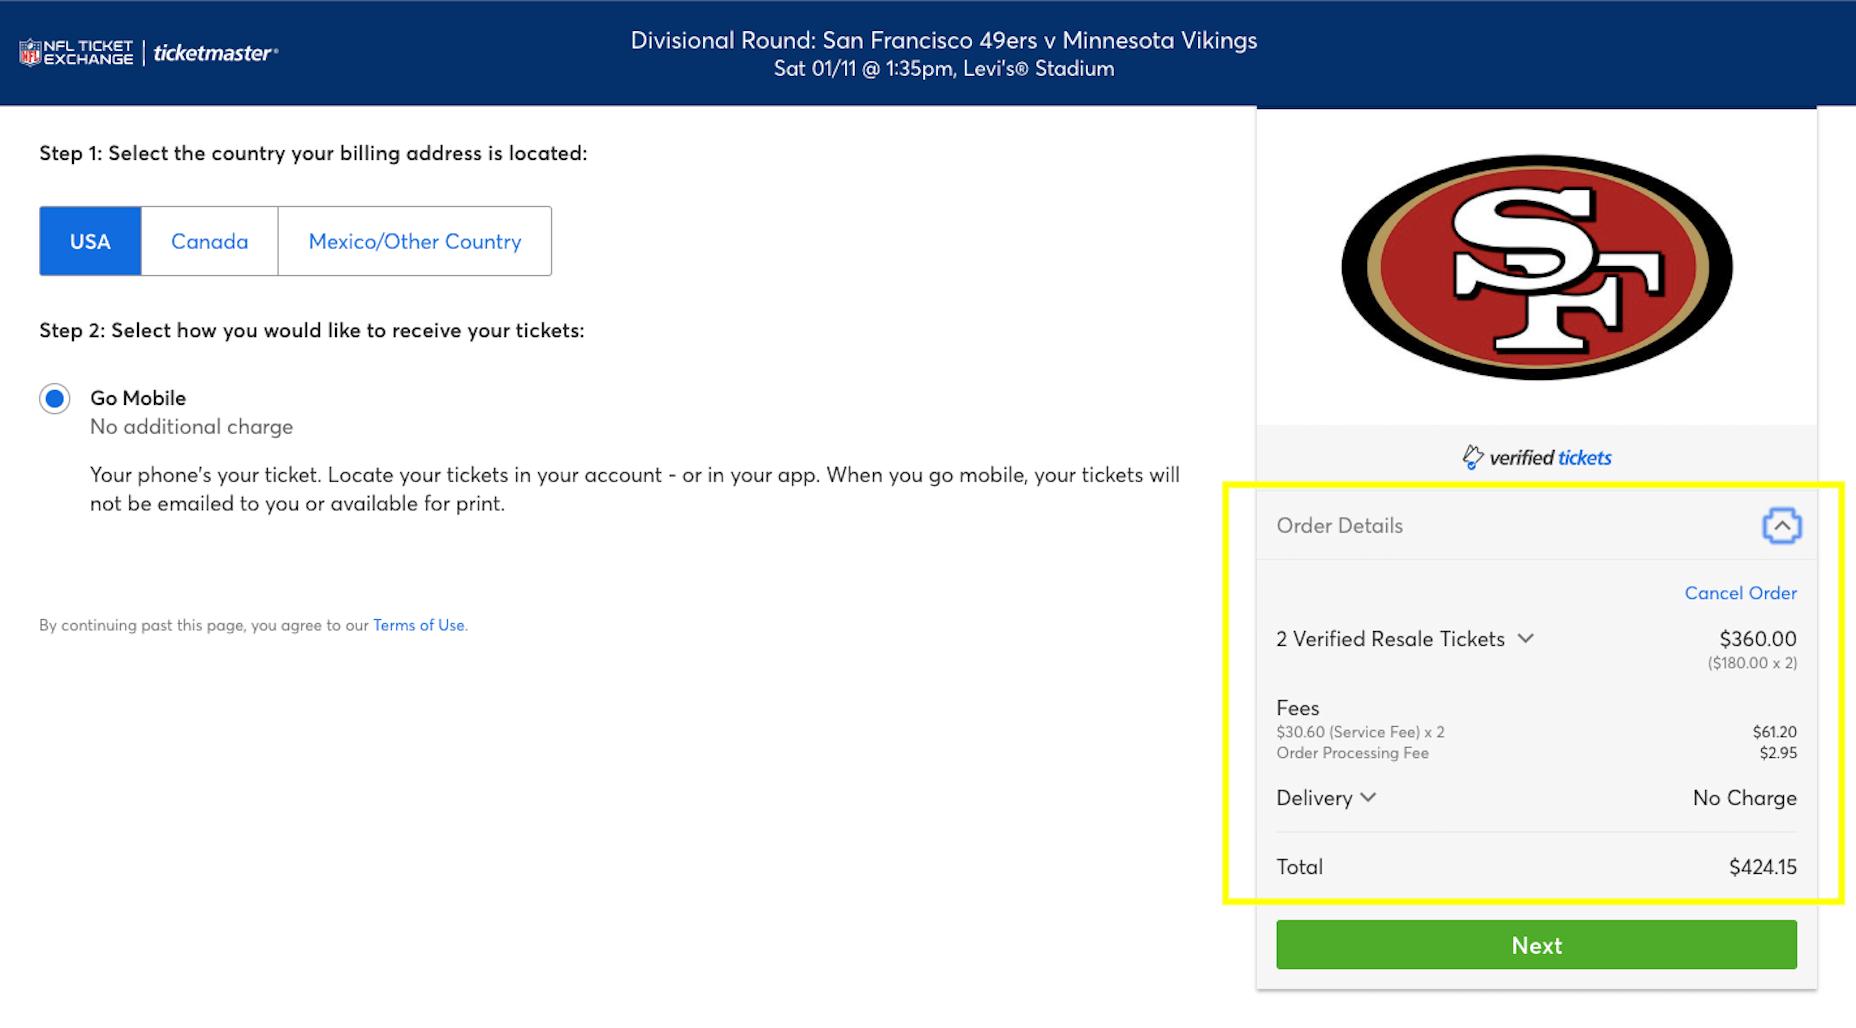 Ticketmaster - Order Details